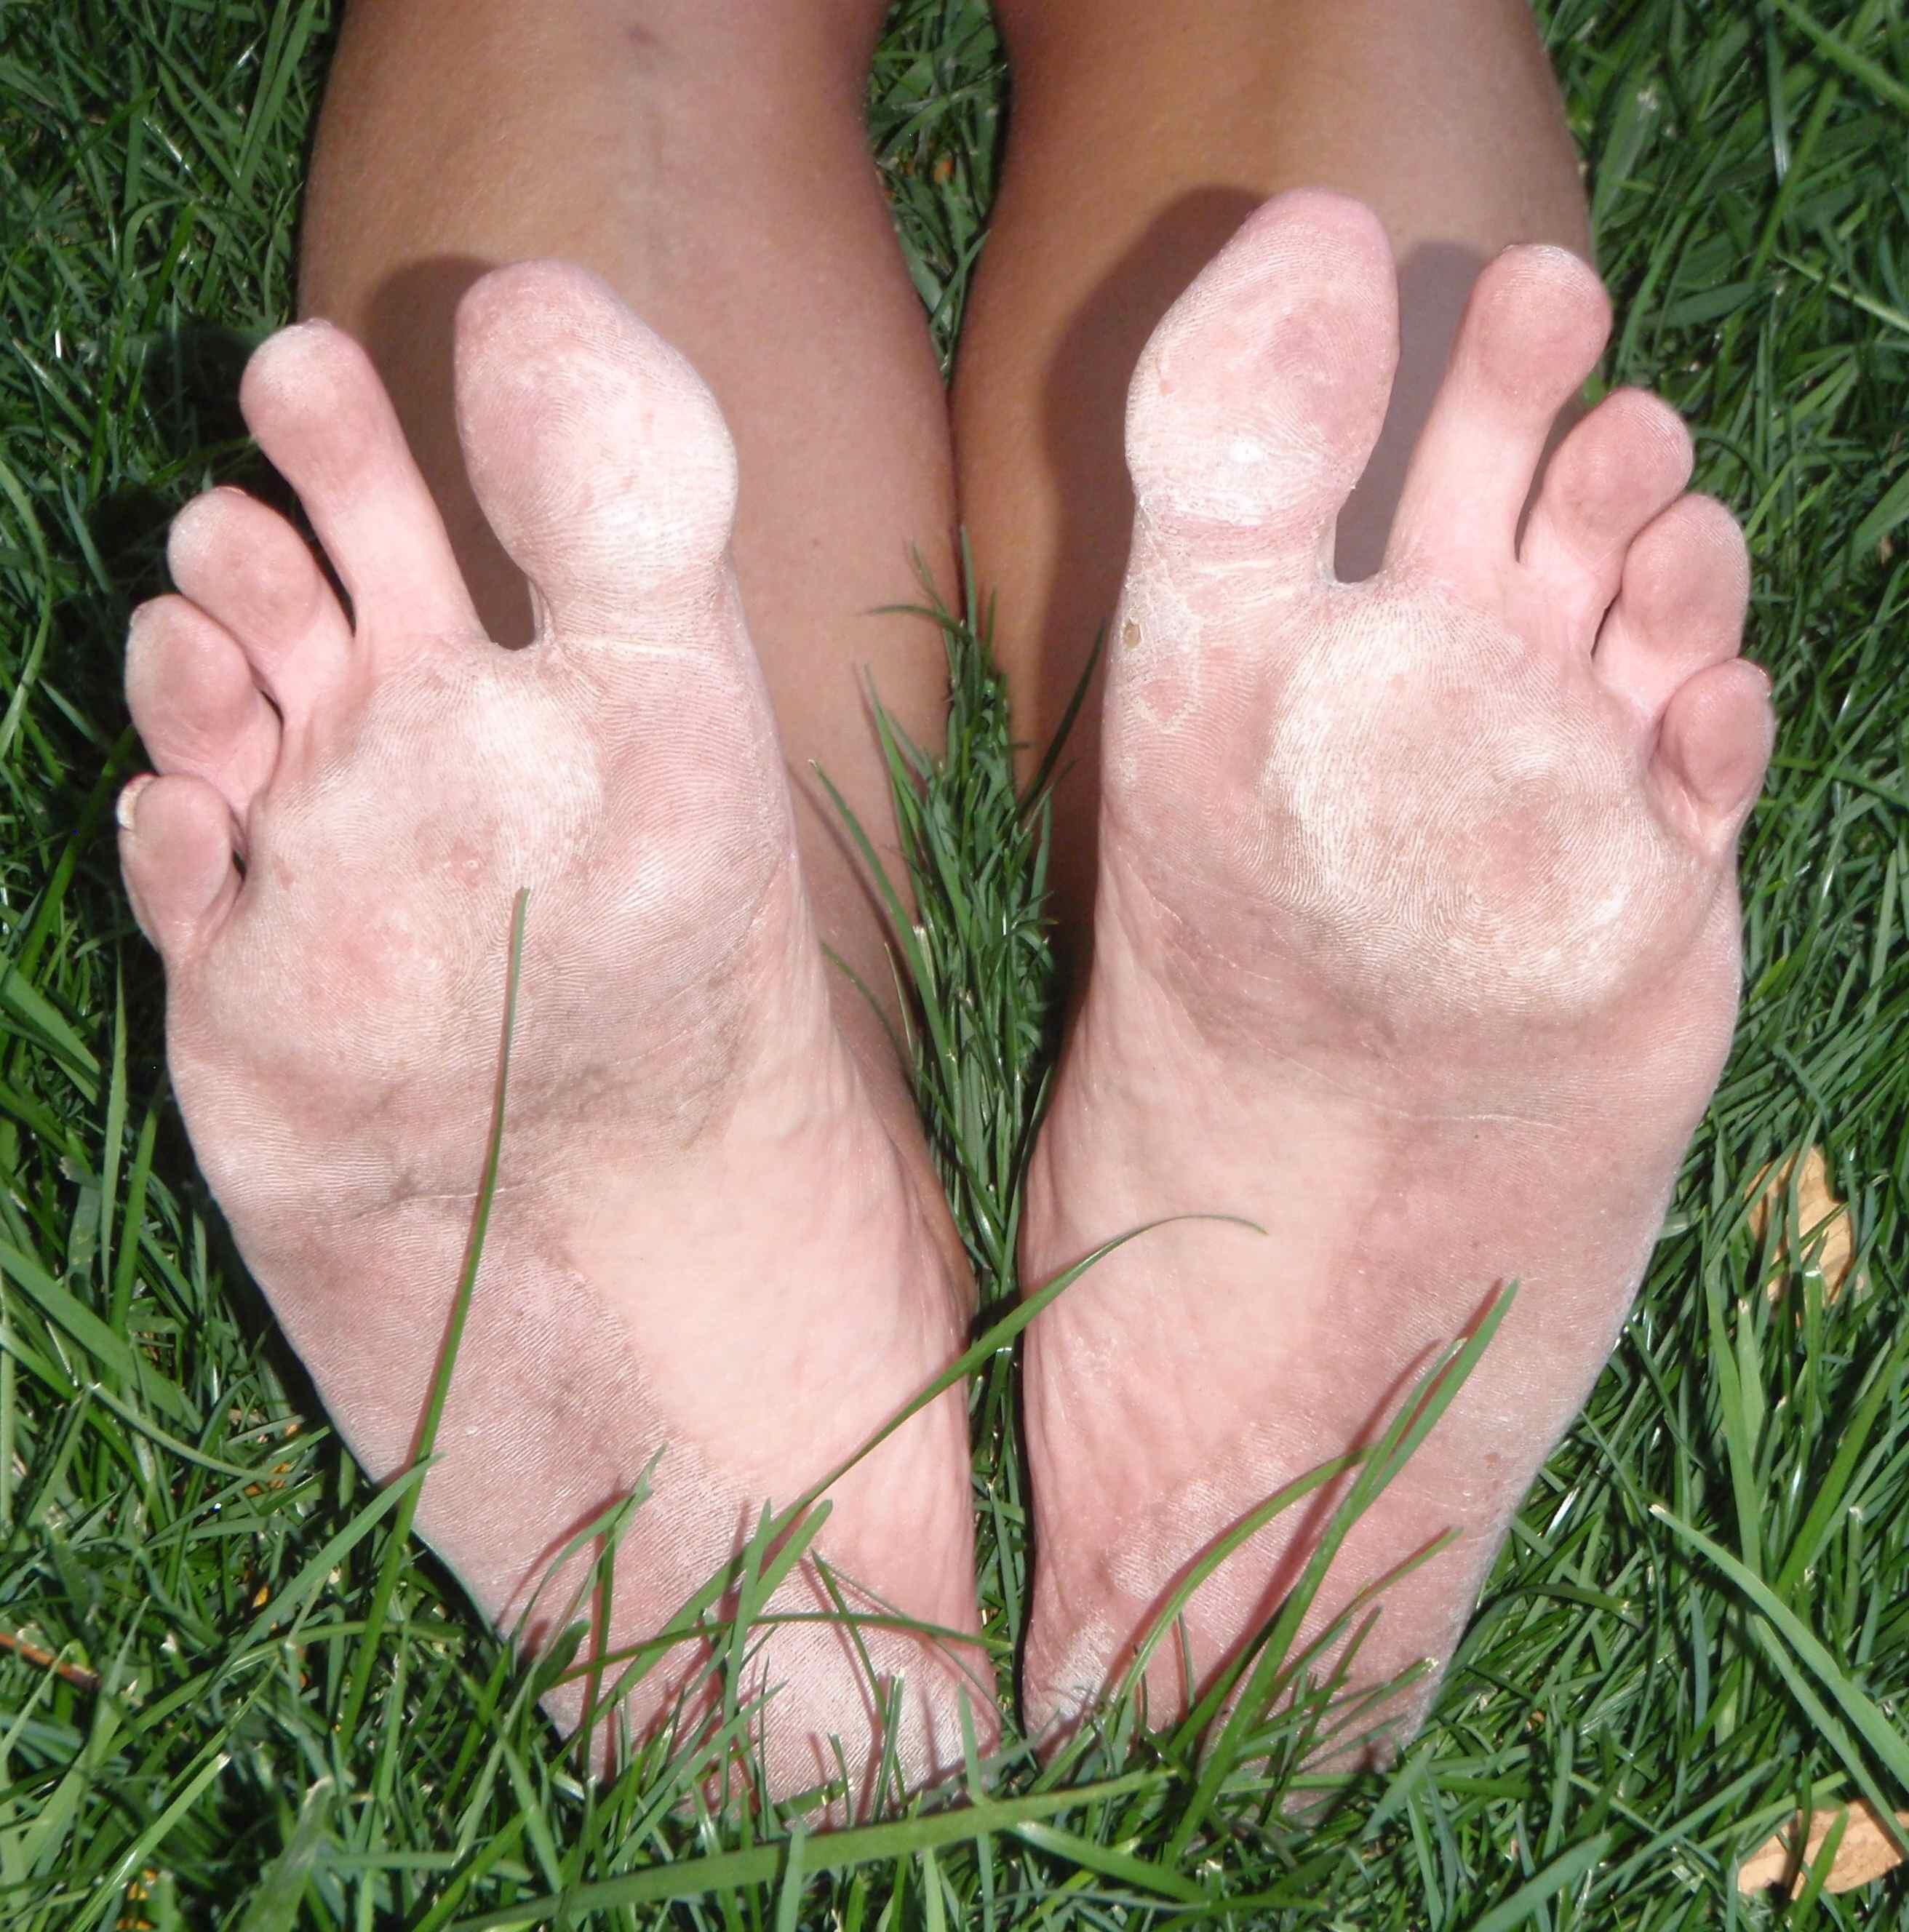 dirty feet immediately after my 4 mile barefoot run on asphalt